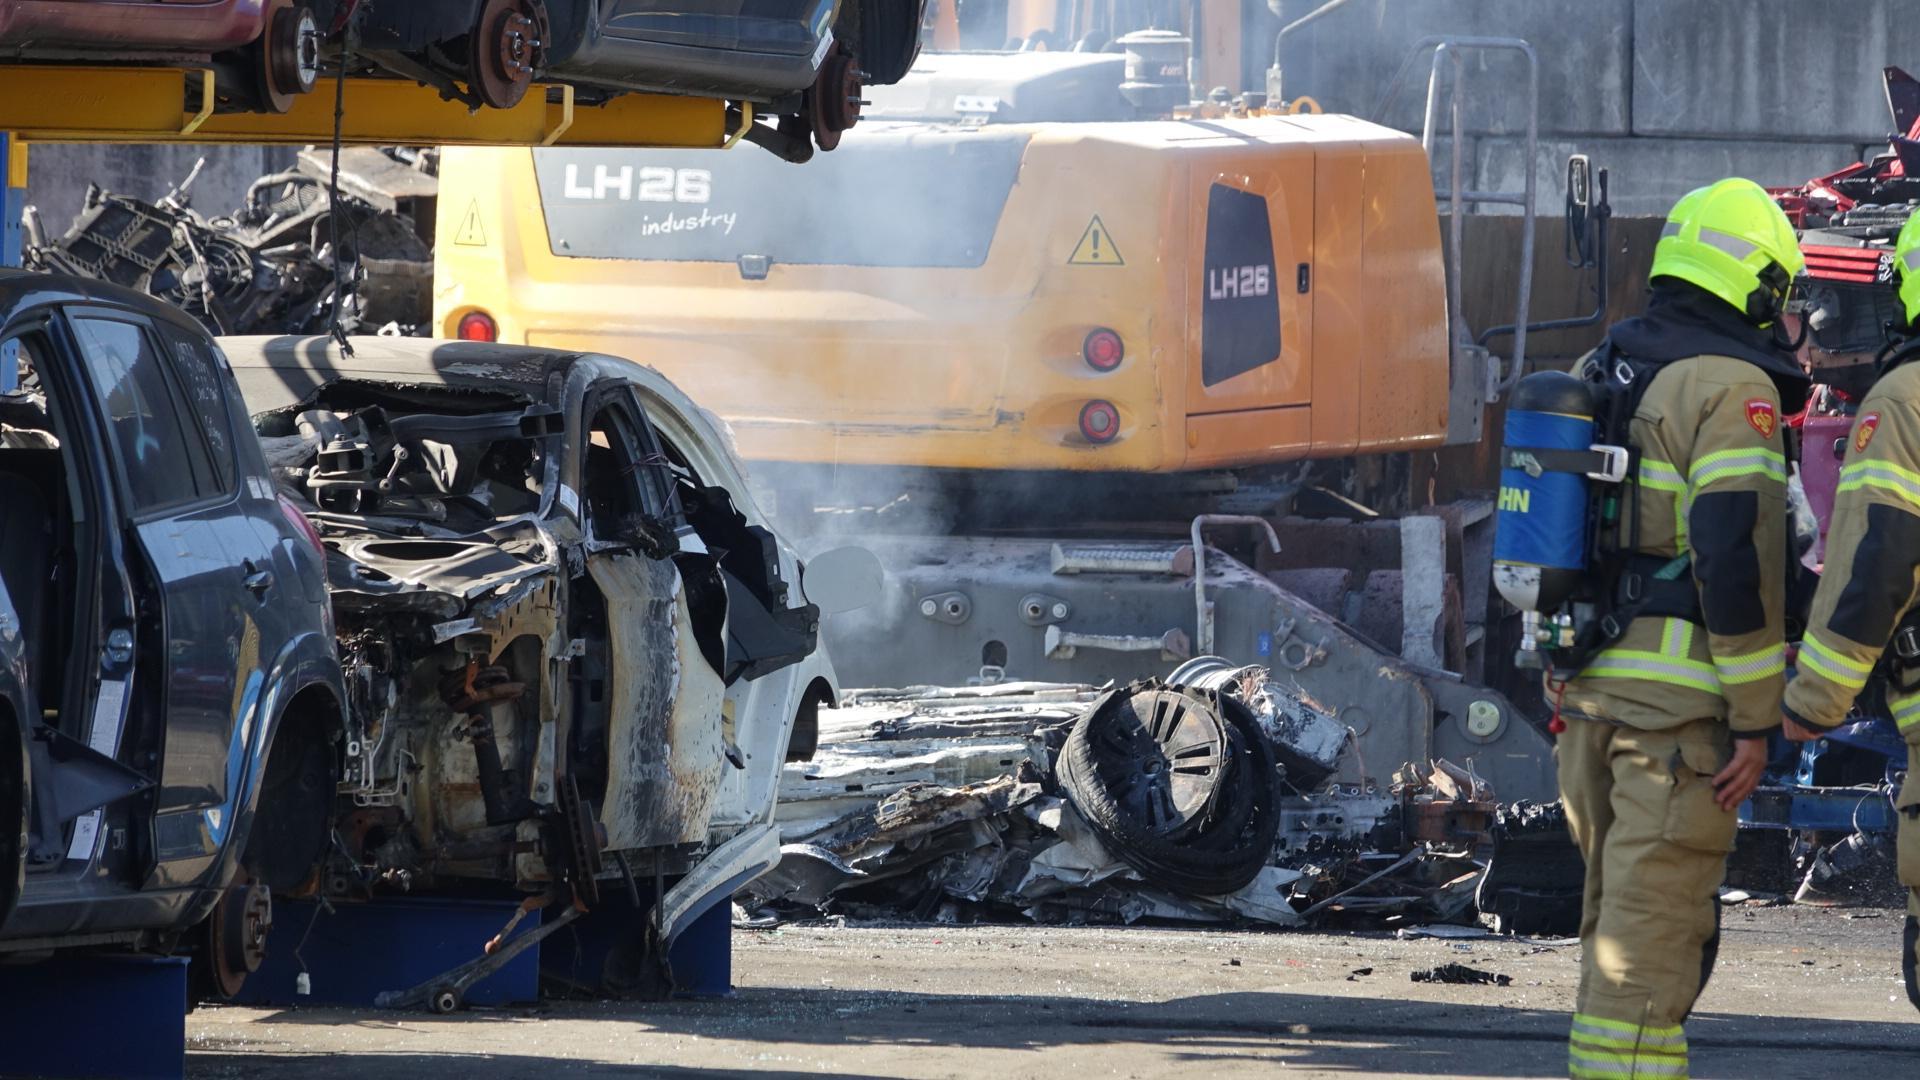 Geplette elektrische auto vliegt in brand bij sloperij in Blokker